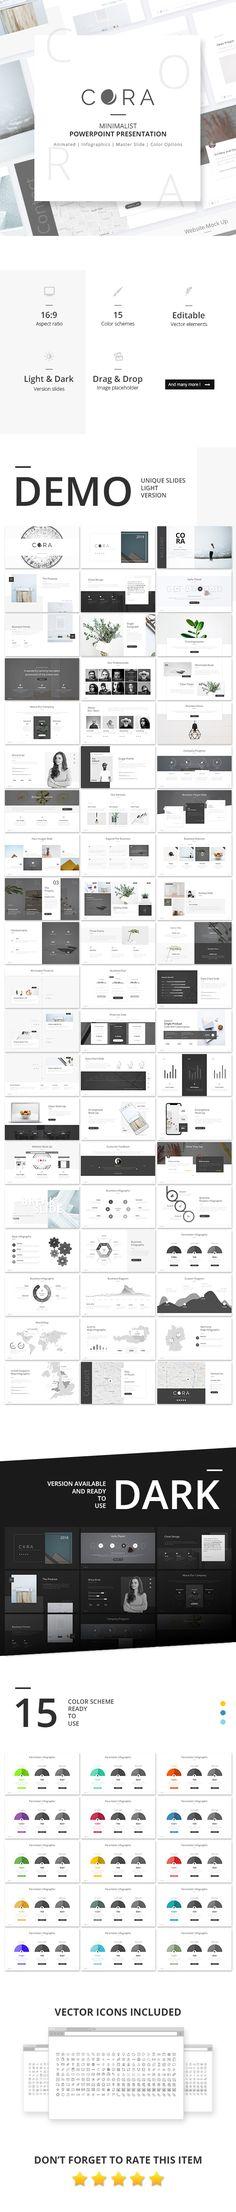 Cora PowerPoint Presentation Template